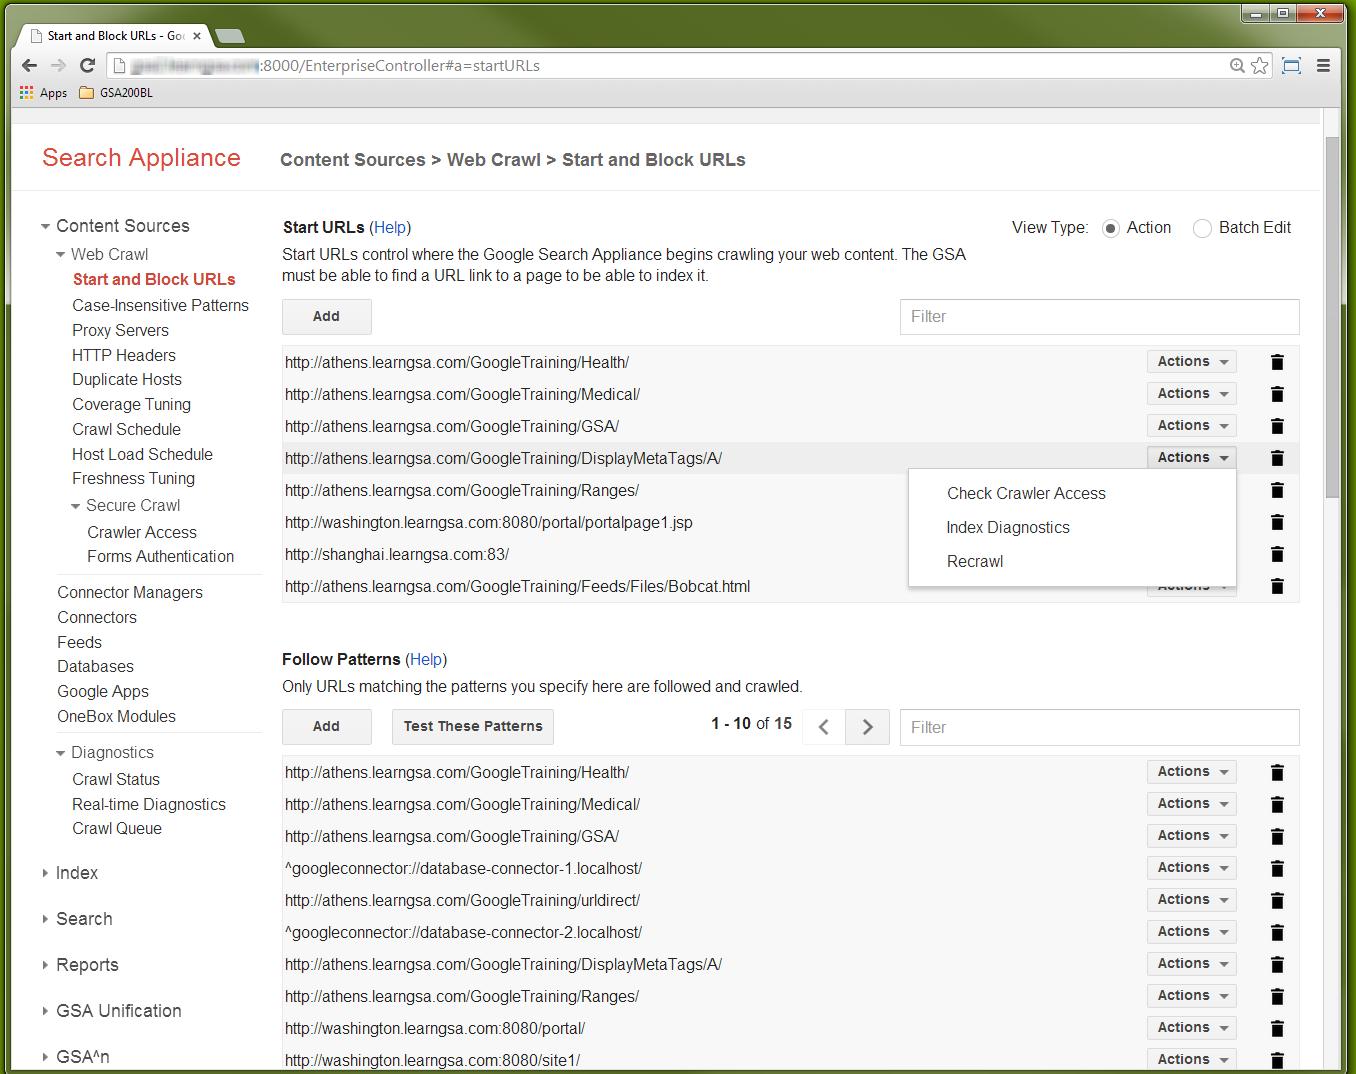 GSA 7.2 - Start URL Actions options